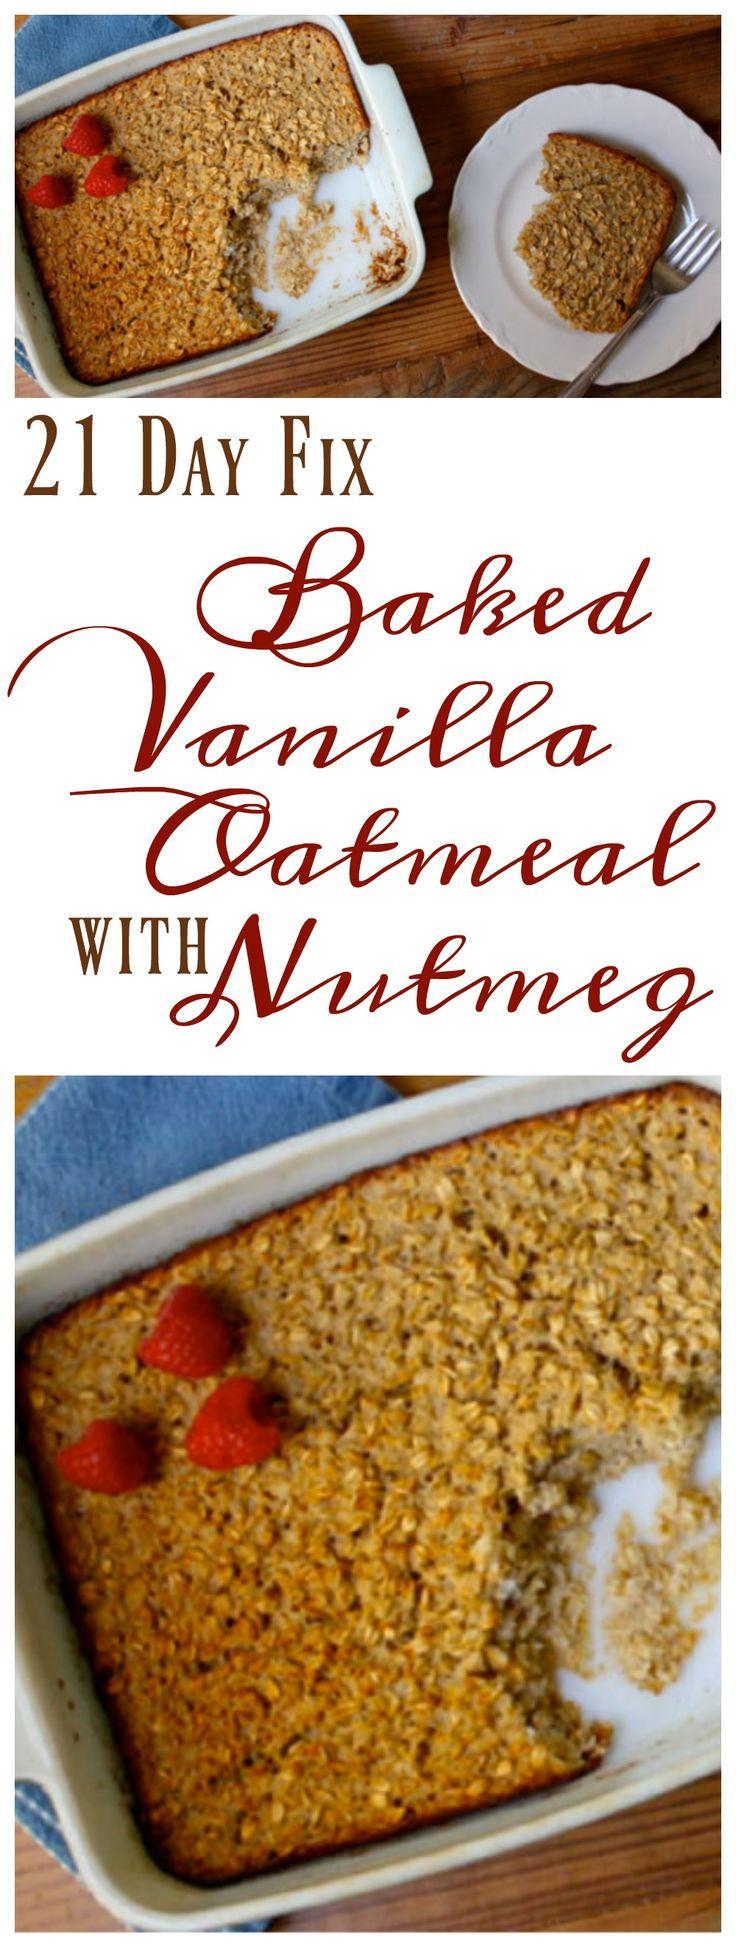 21 Day Fix Baked Oatmeal - Baked Vanilla Oatmeal with Nutmeg